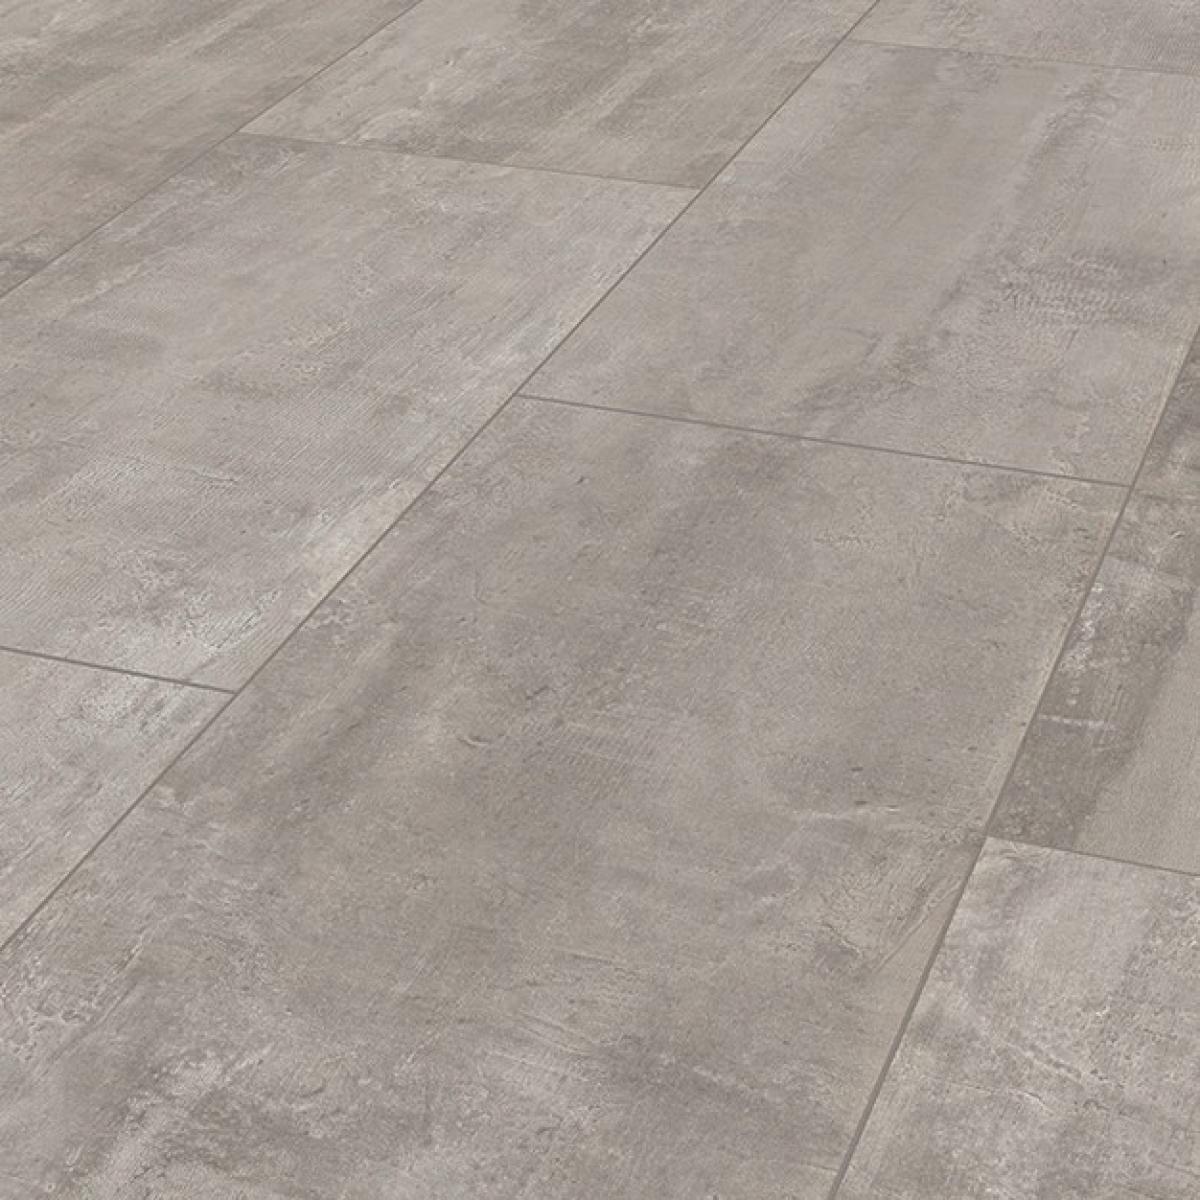 Krono 8mm cross town traffic tile Laminate Flooring in